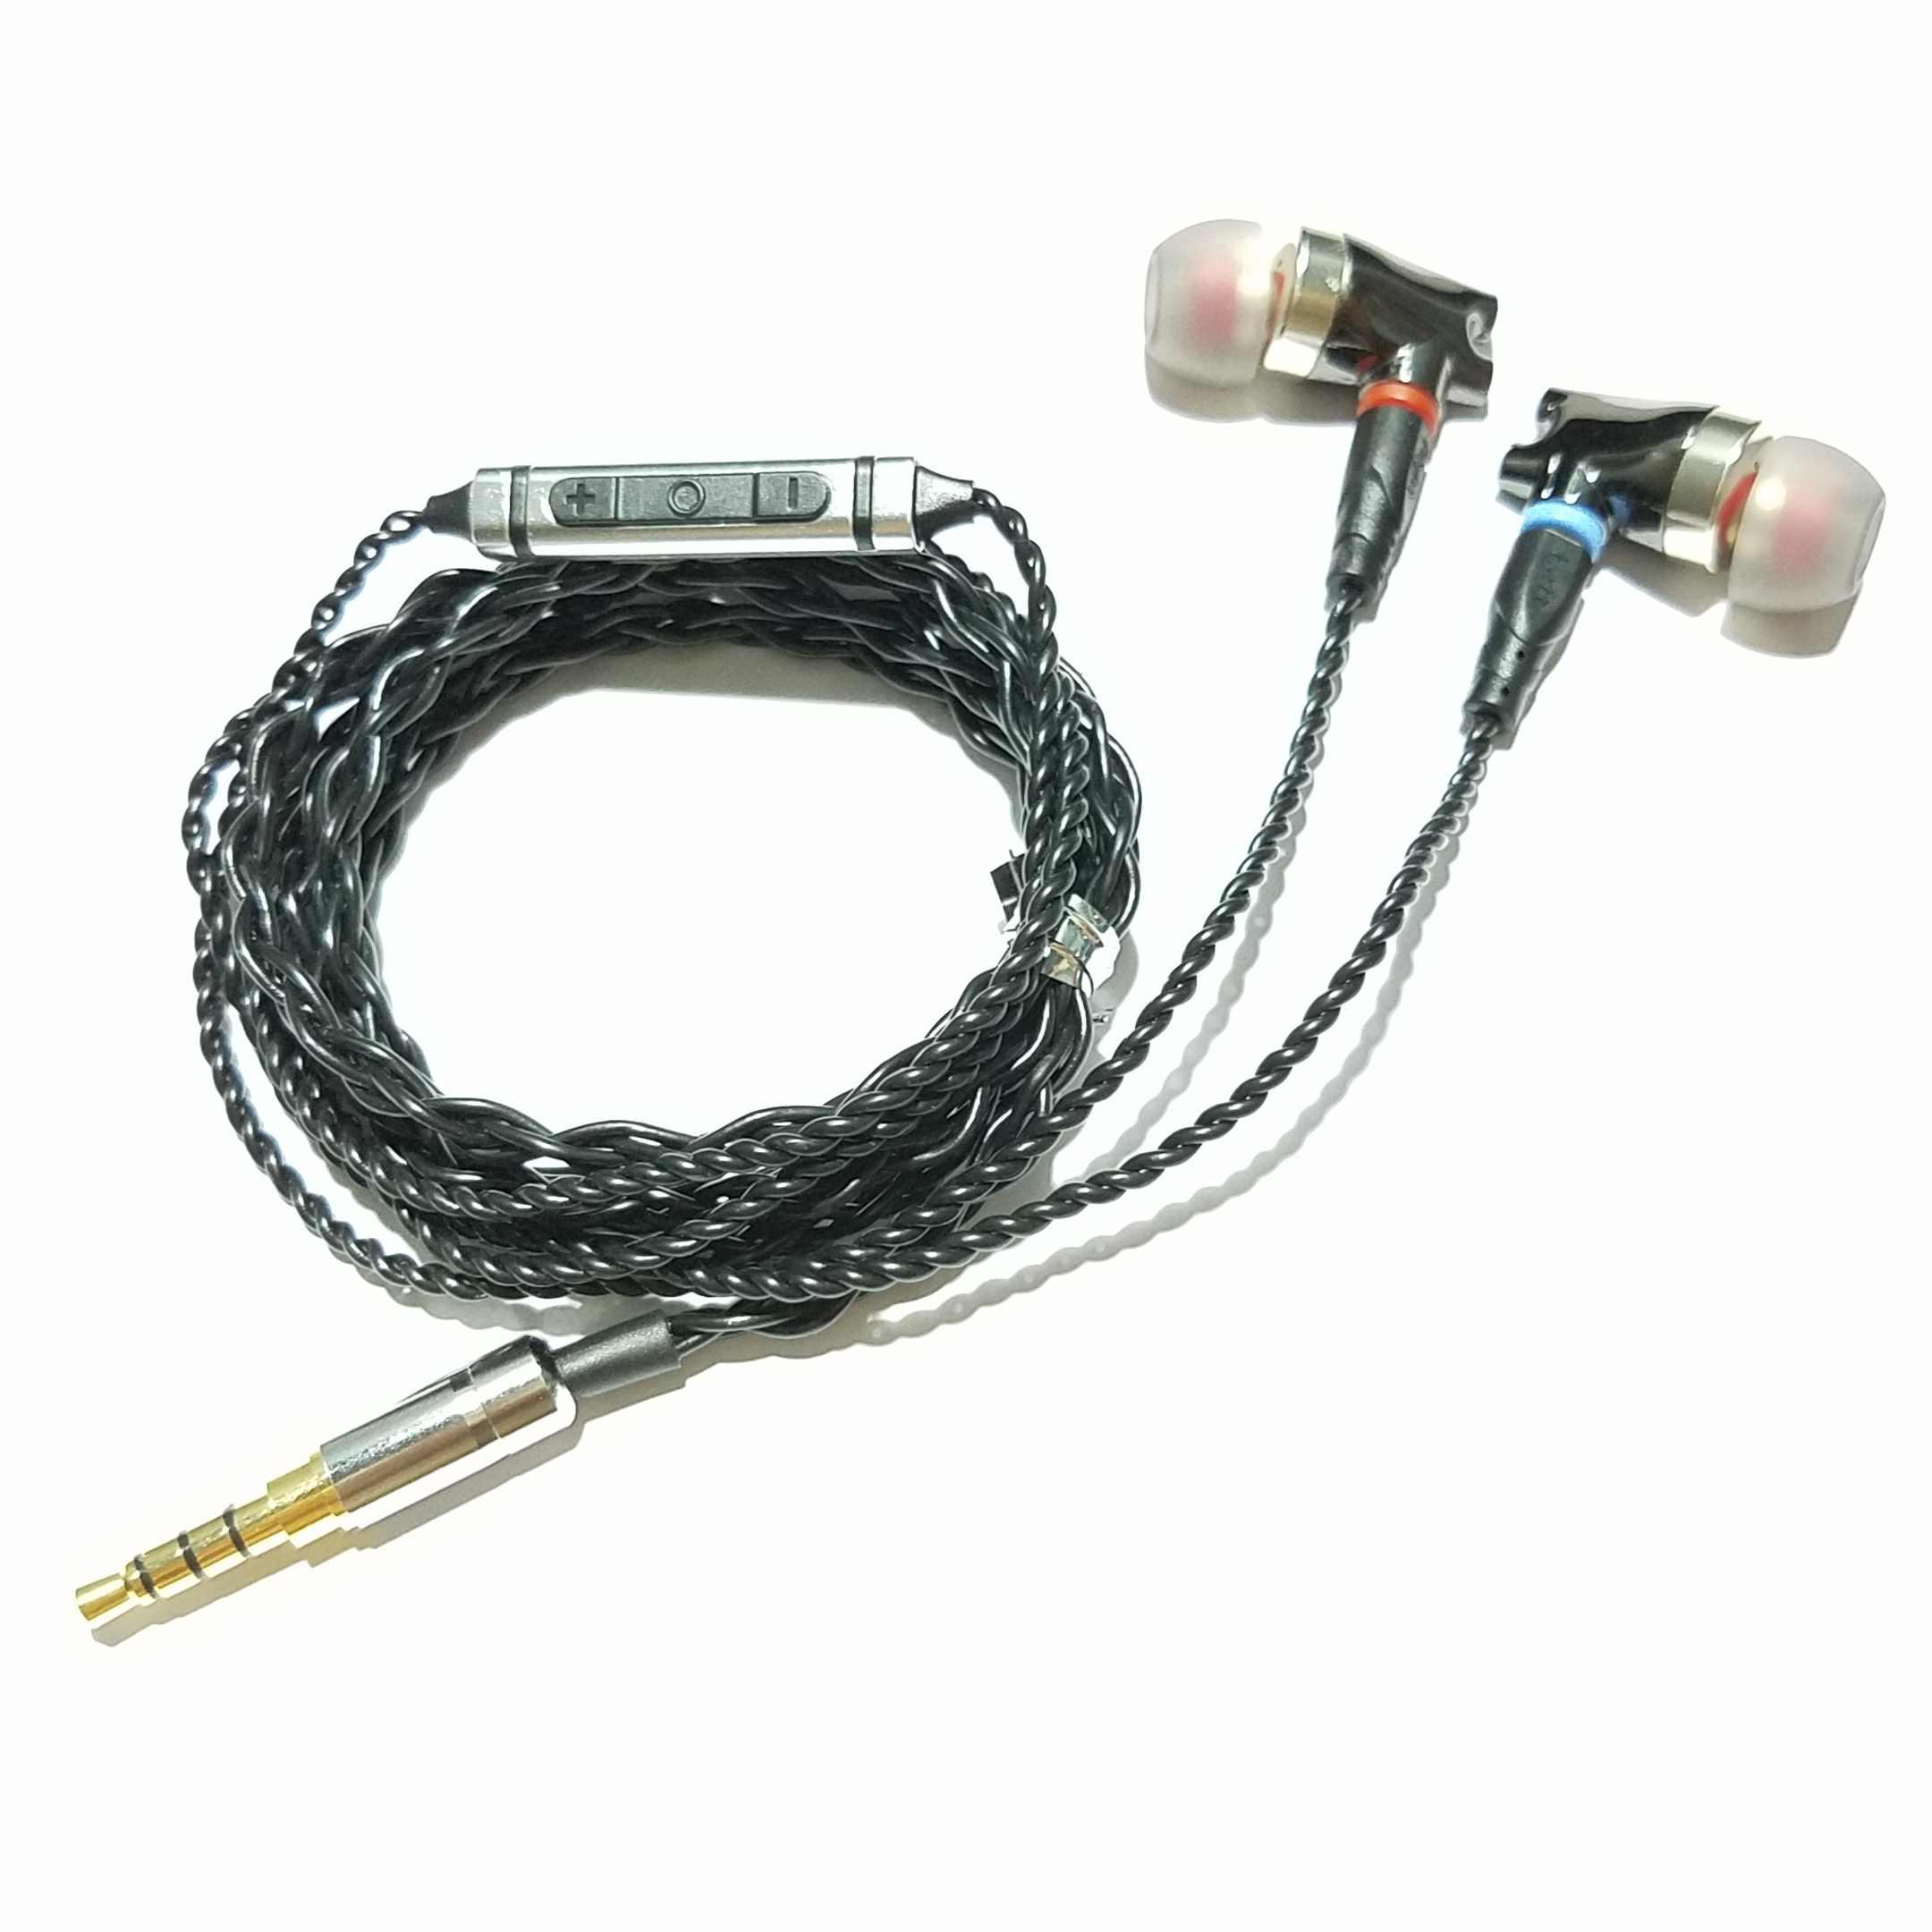 NEW technology 2019 Hi-Res Audio Hybrid earphone Balanced Armature Noise Cancellation for xiaomi samsung se535 se846 ie800 UE900